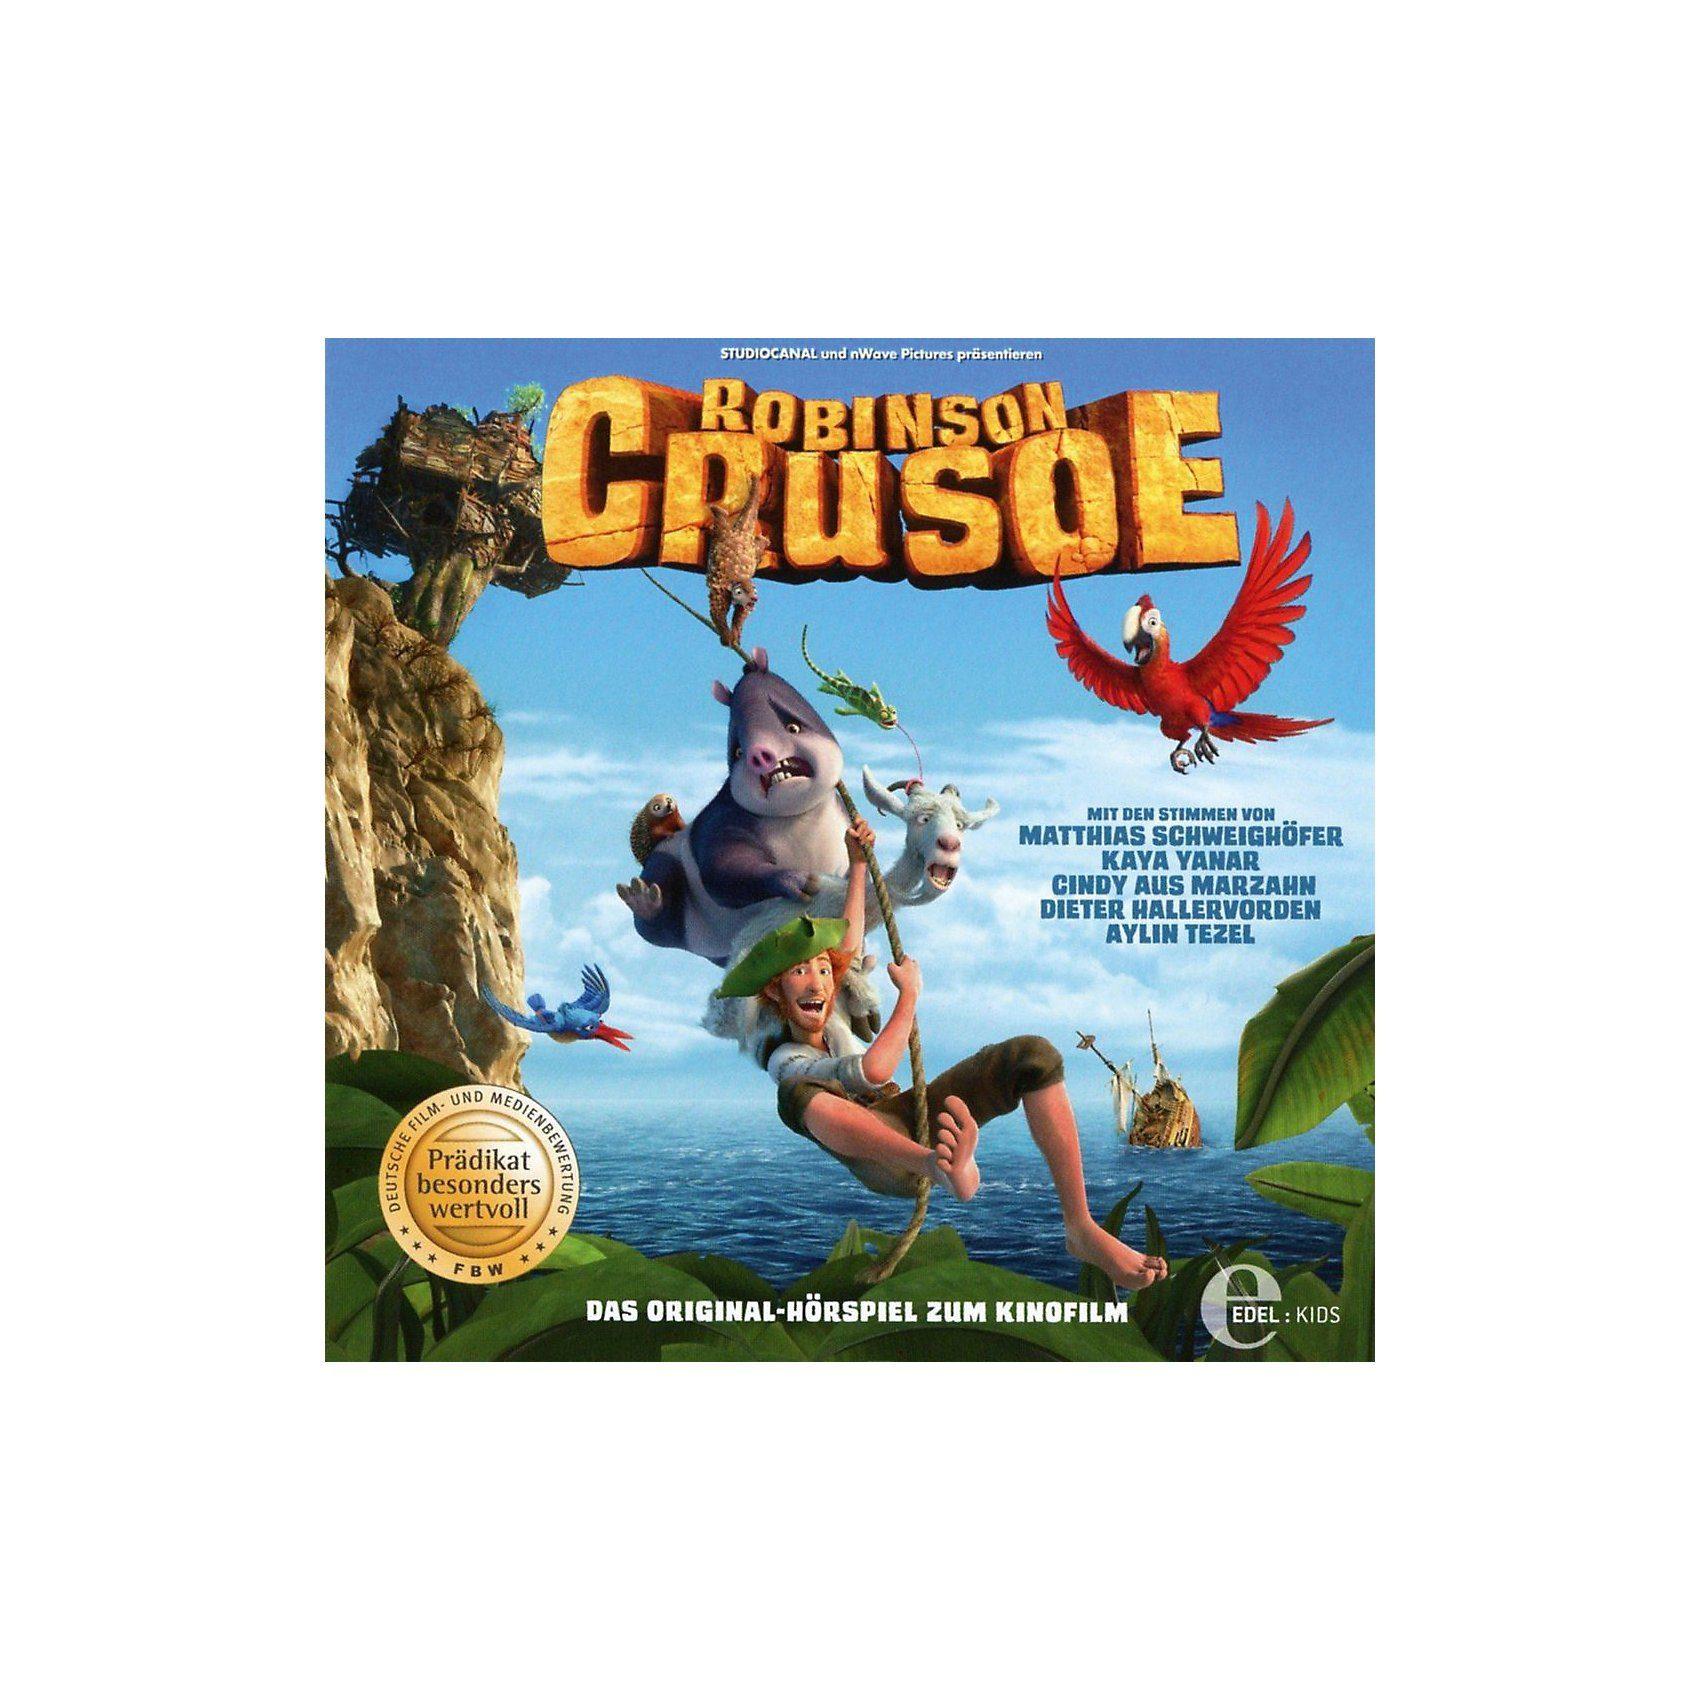 Edel CD Robinson Crusoe - Das Original-Hörspiel zum Kinofilm